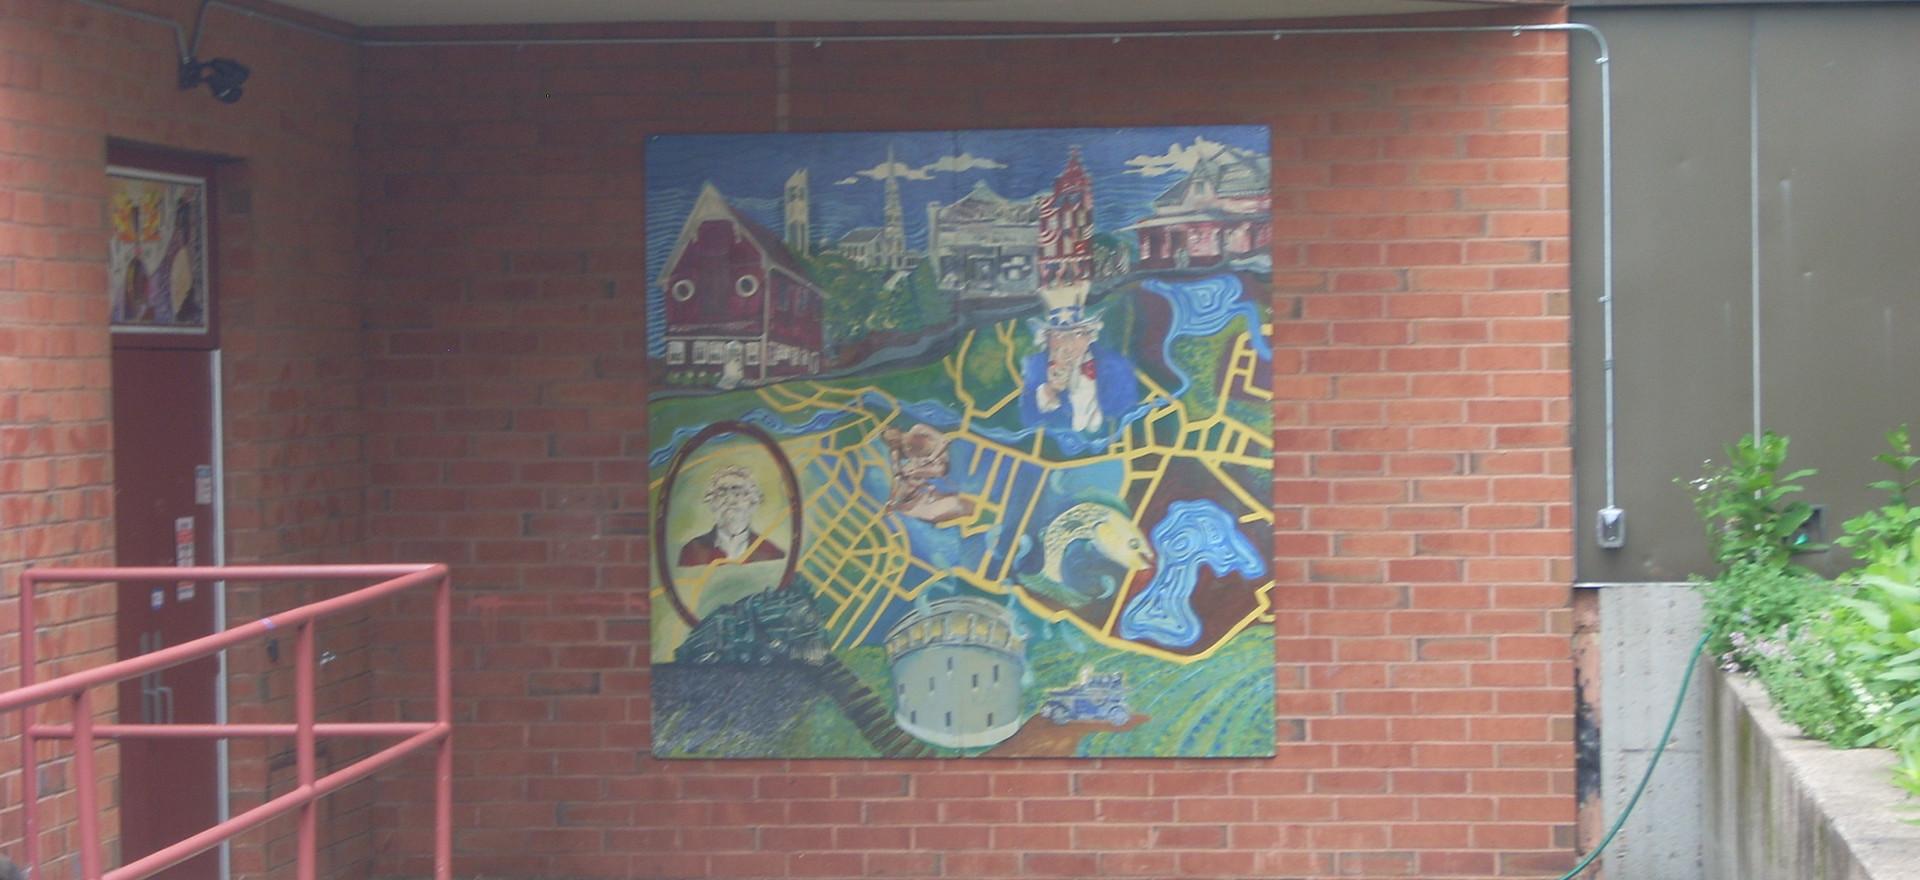 41 Foster St mural